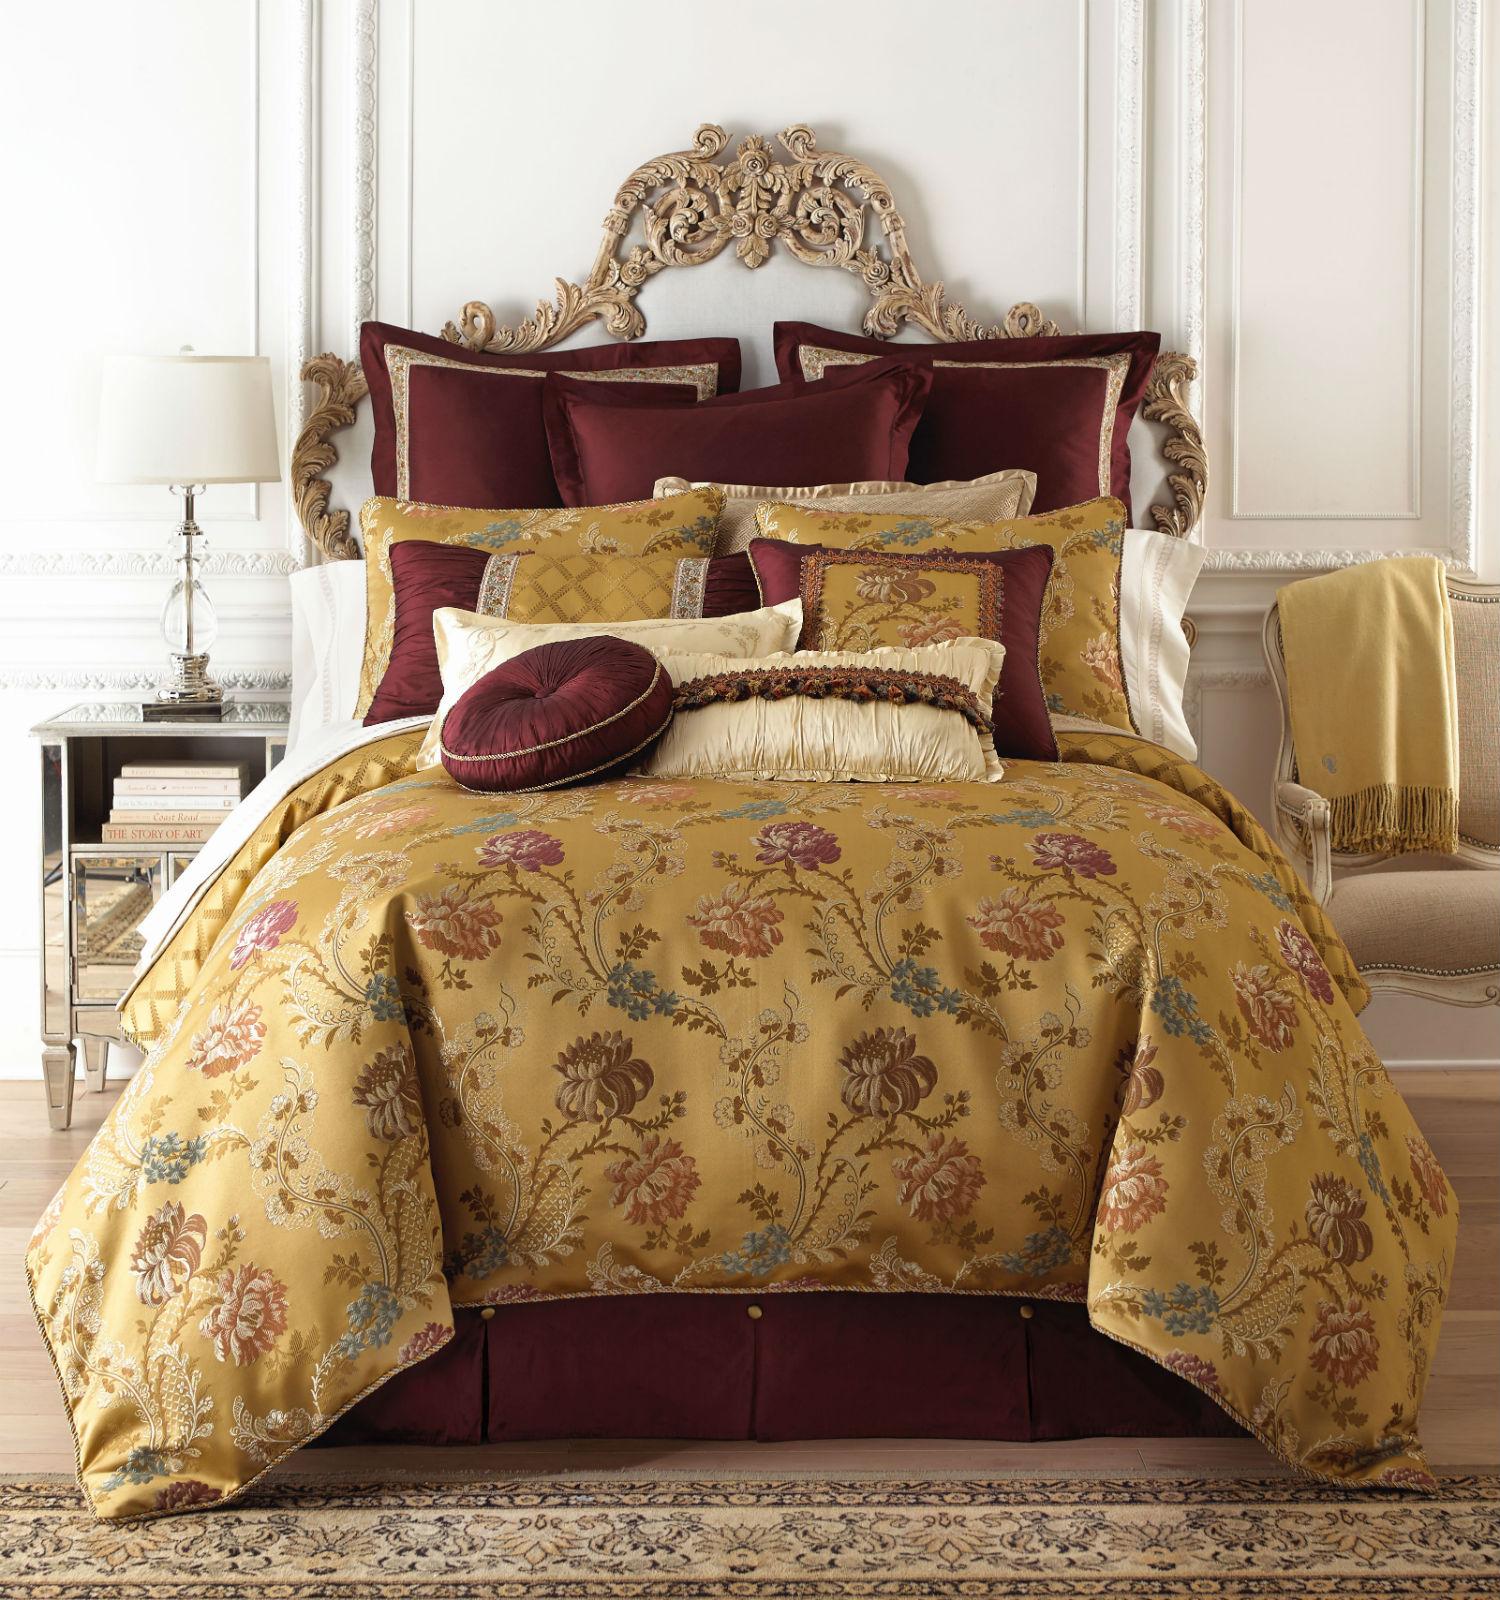 Tropical Luxury Bedding